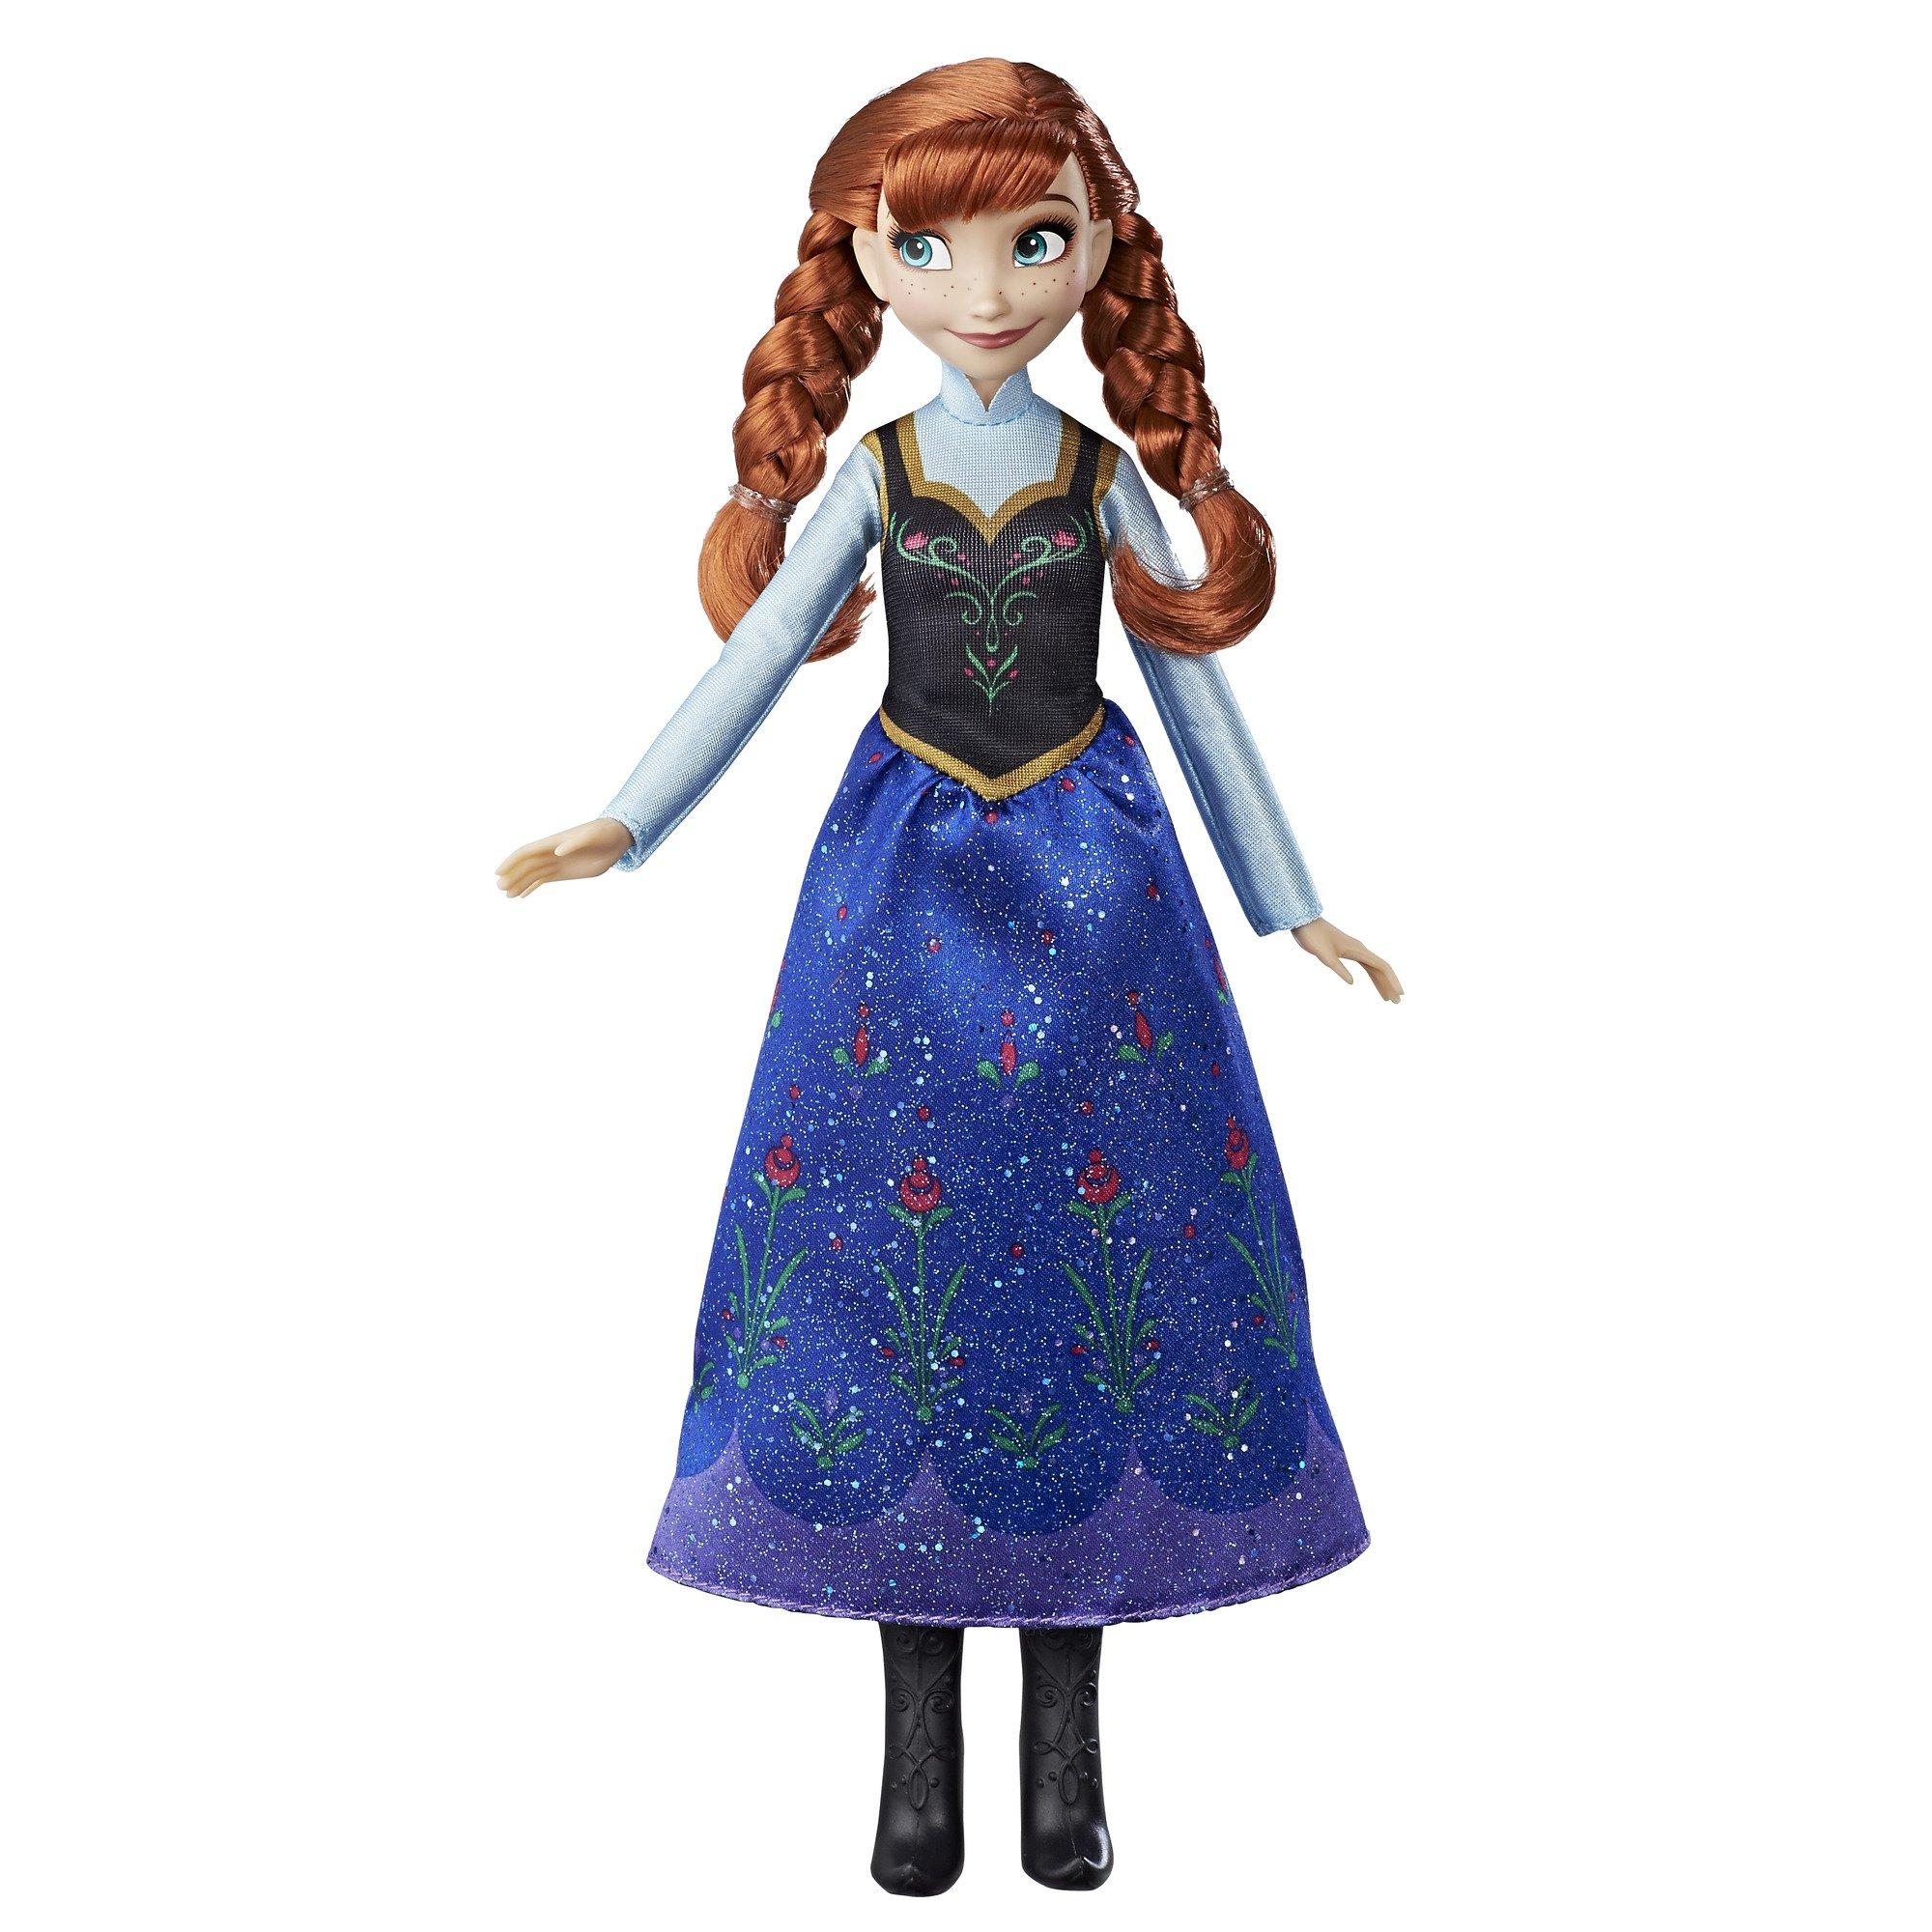 Precise Disney Frozen Anna Doll With Free Elsa Fragrant Aroma Dolls & Bears Disney